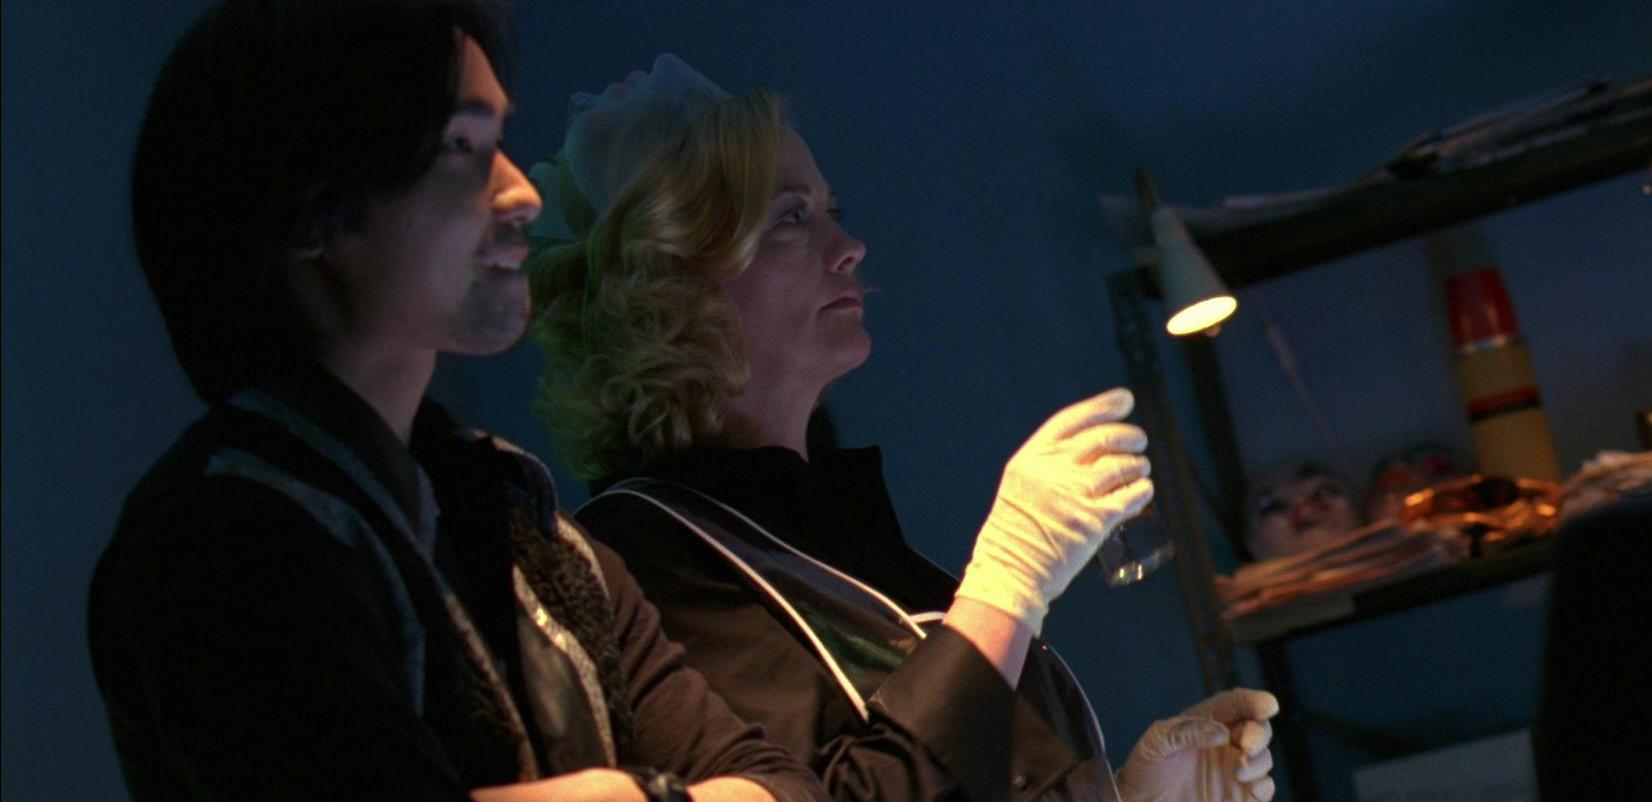 James Liao and Cybill Shepherd in Hard Luck (2006)